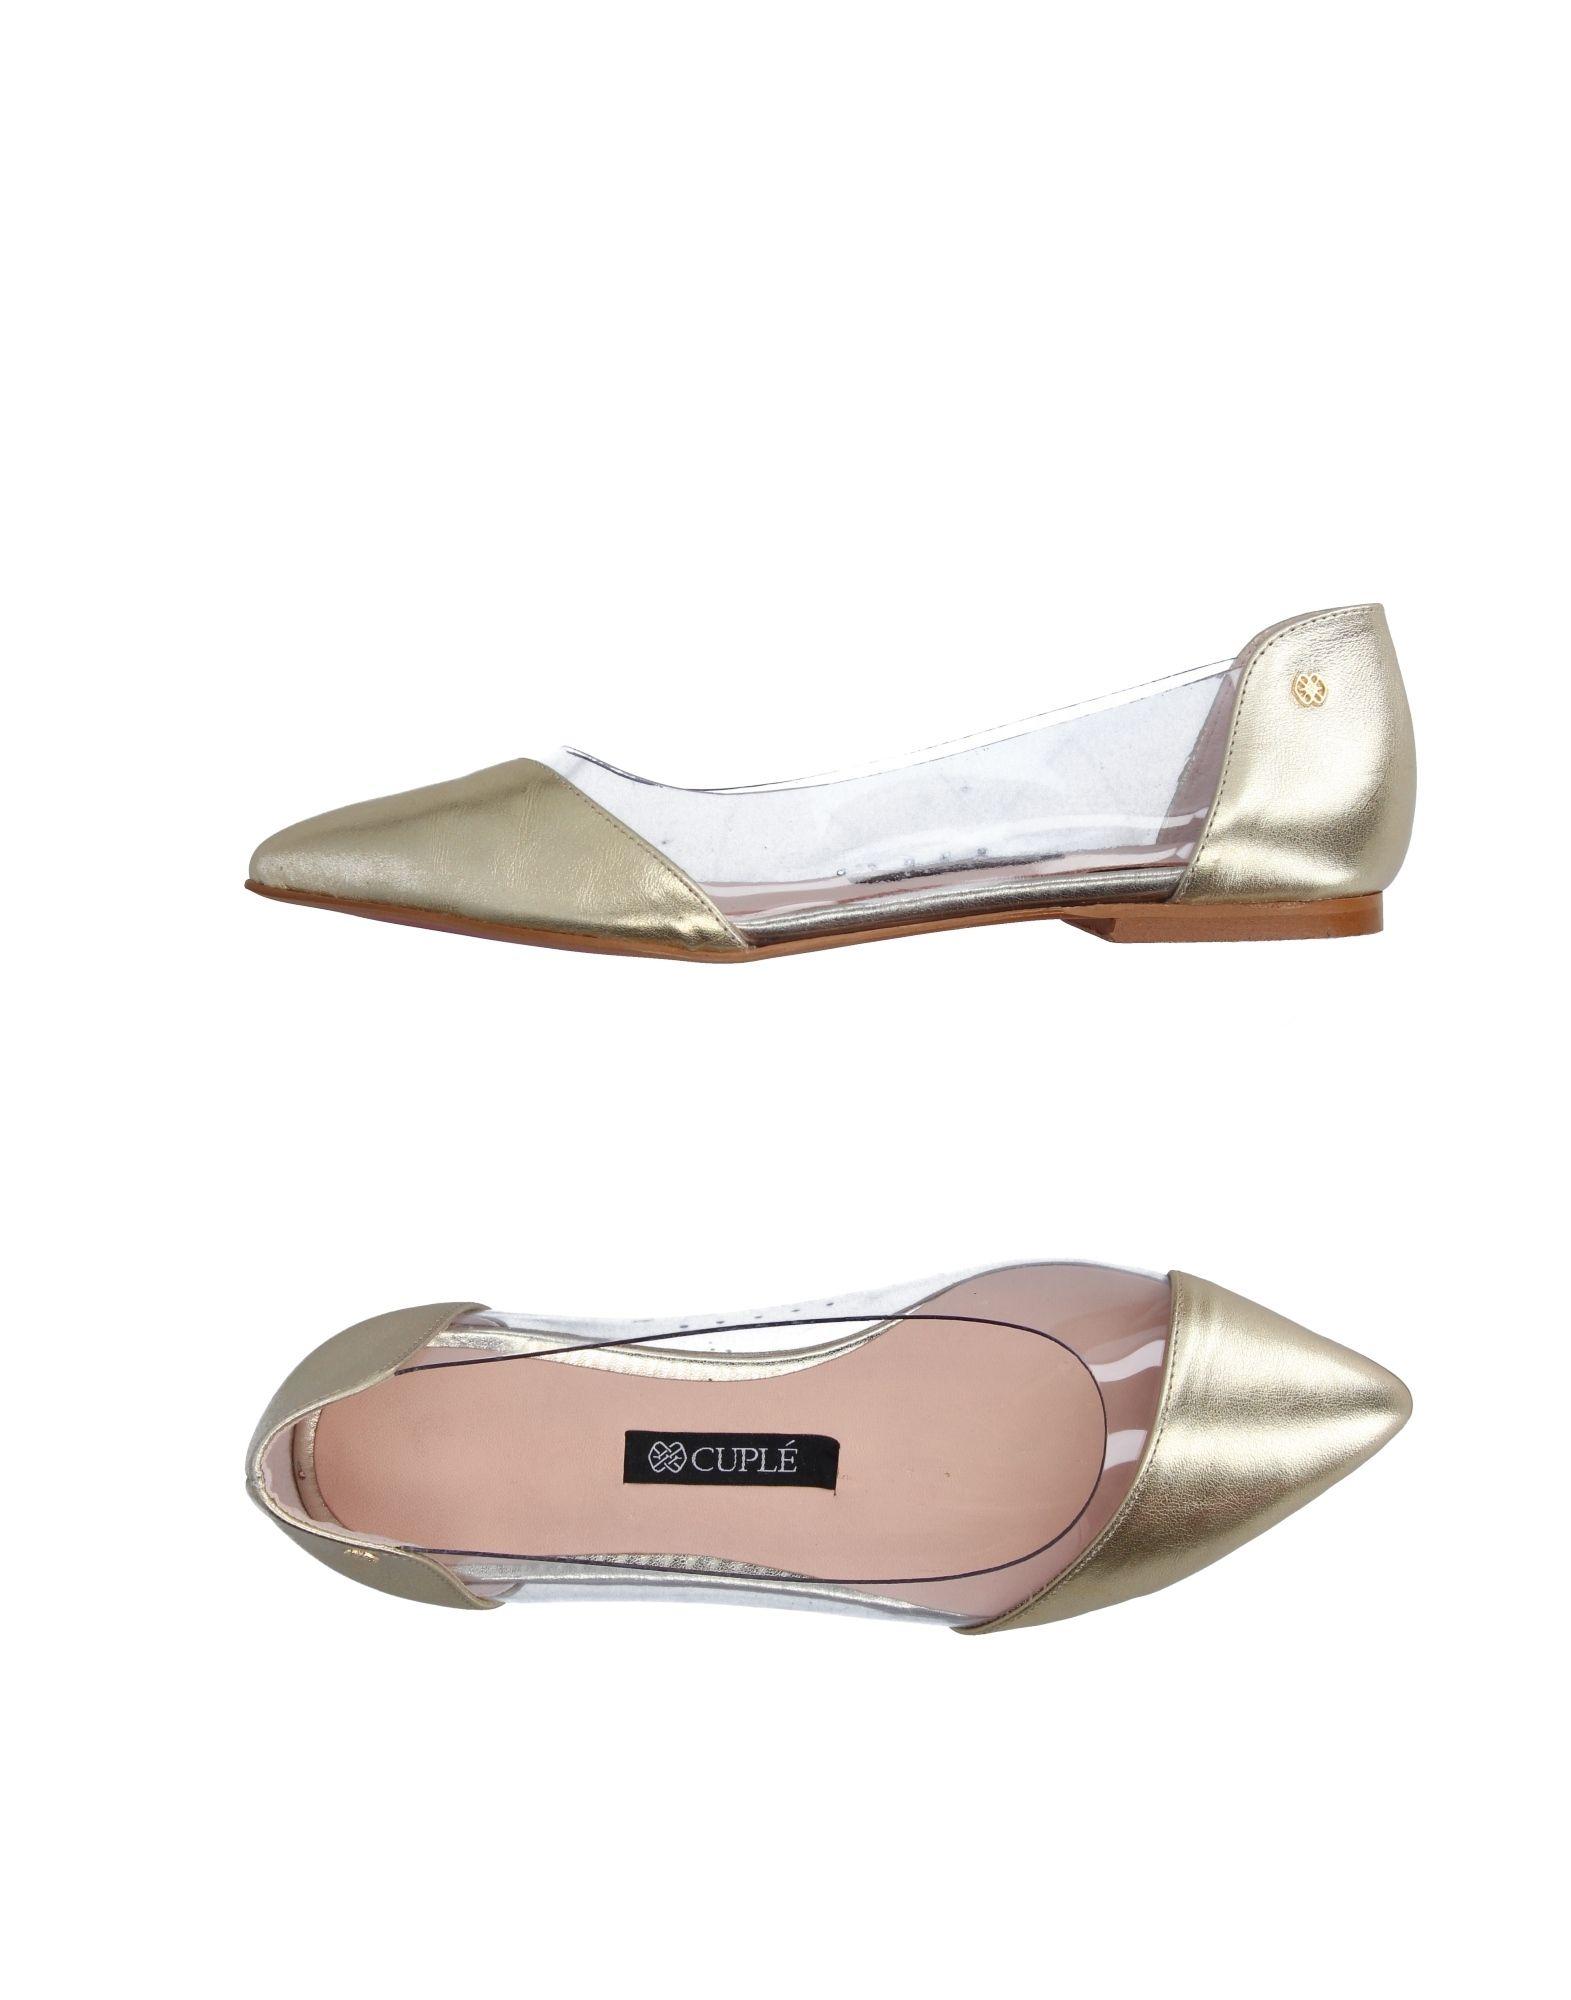 Cuplé Ballerinas Damen  11218171TD Gute Qualität beliebte Schuhe